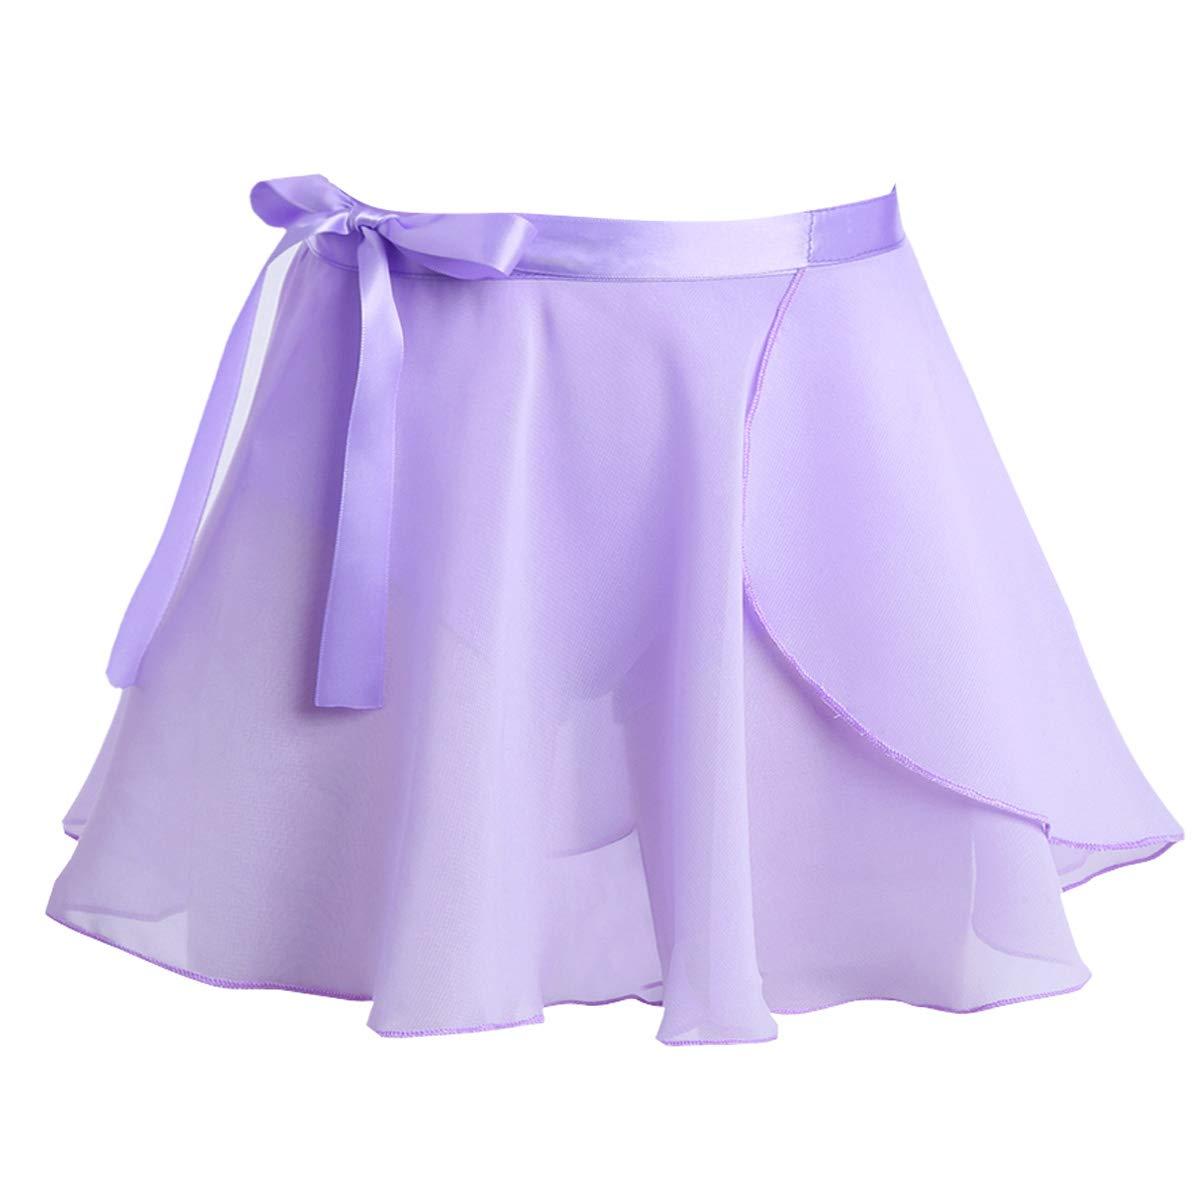 TiaoBug Girls' Ballet Wrap Skirt with Tie Waist Chiffon Basic Wrap Tutu Dancewear Costumes Lavender 3-4